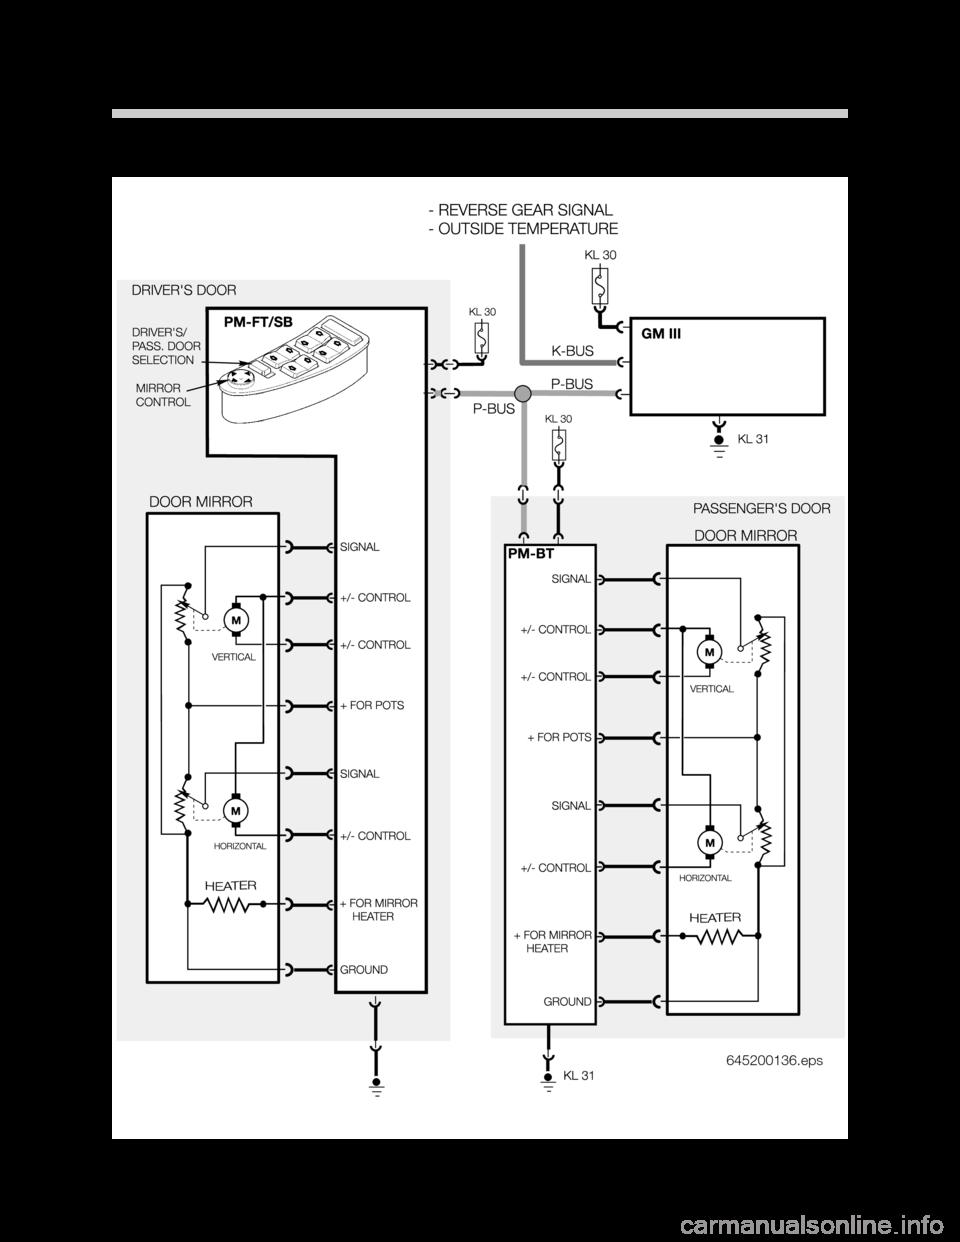 bmw x5 2003 e53 central body electronics zke manual